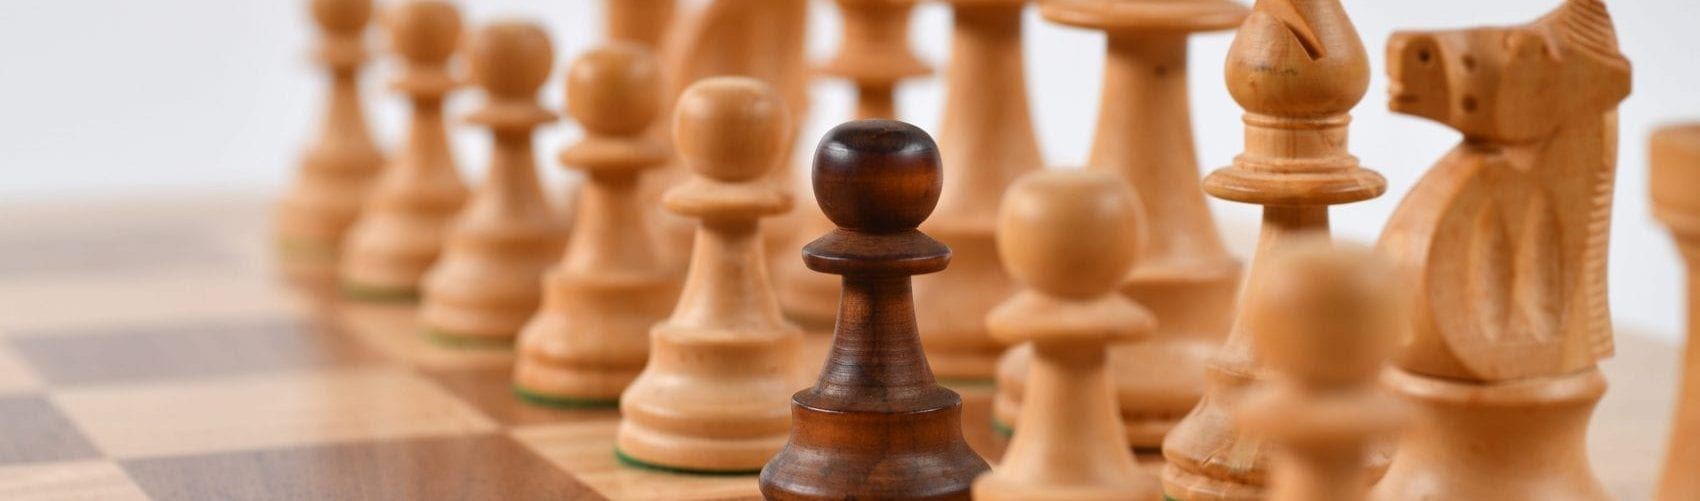 Chess Strategy Image